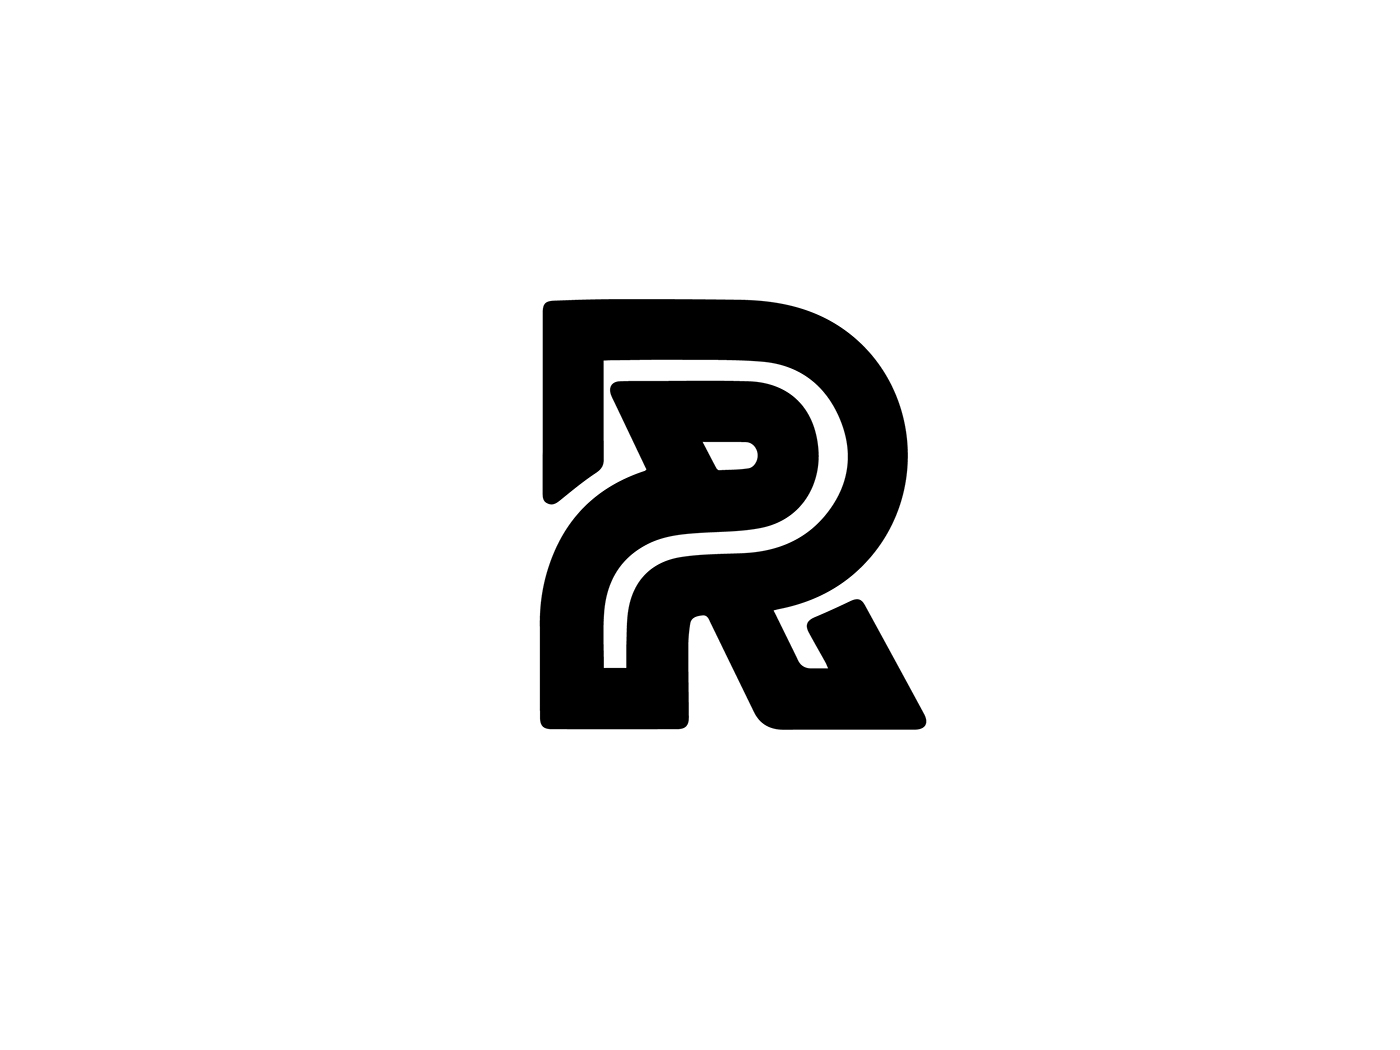 logo design r